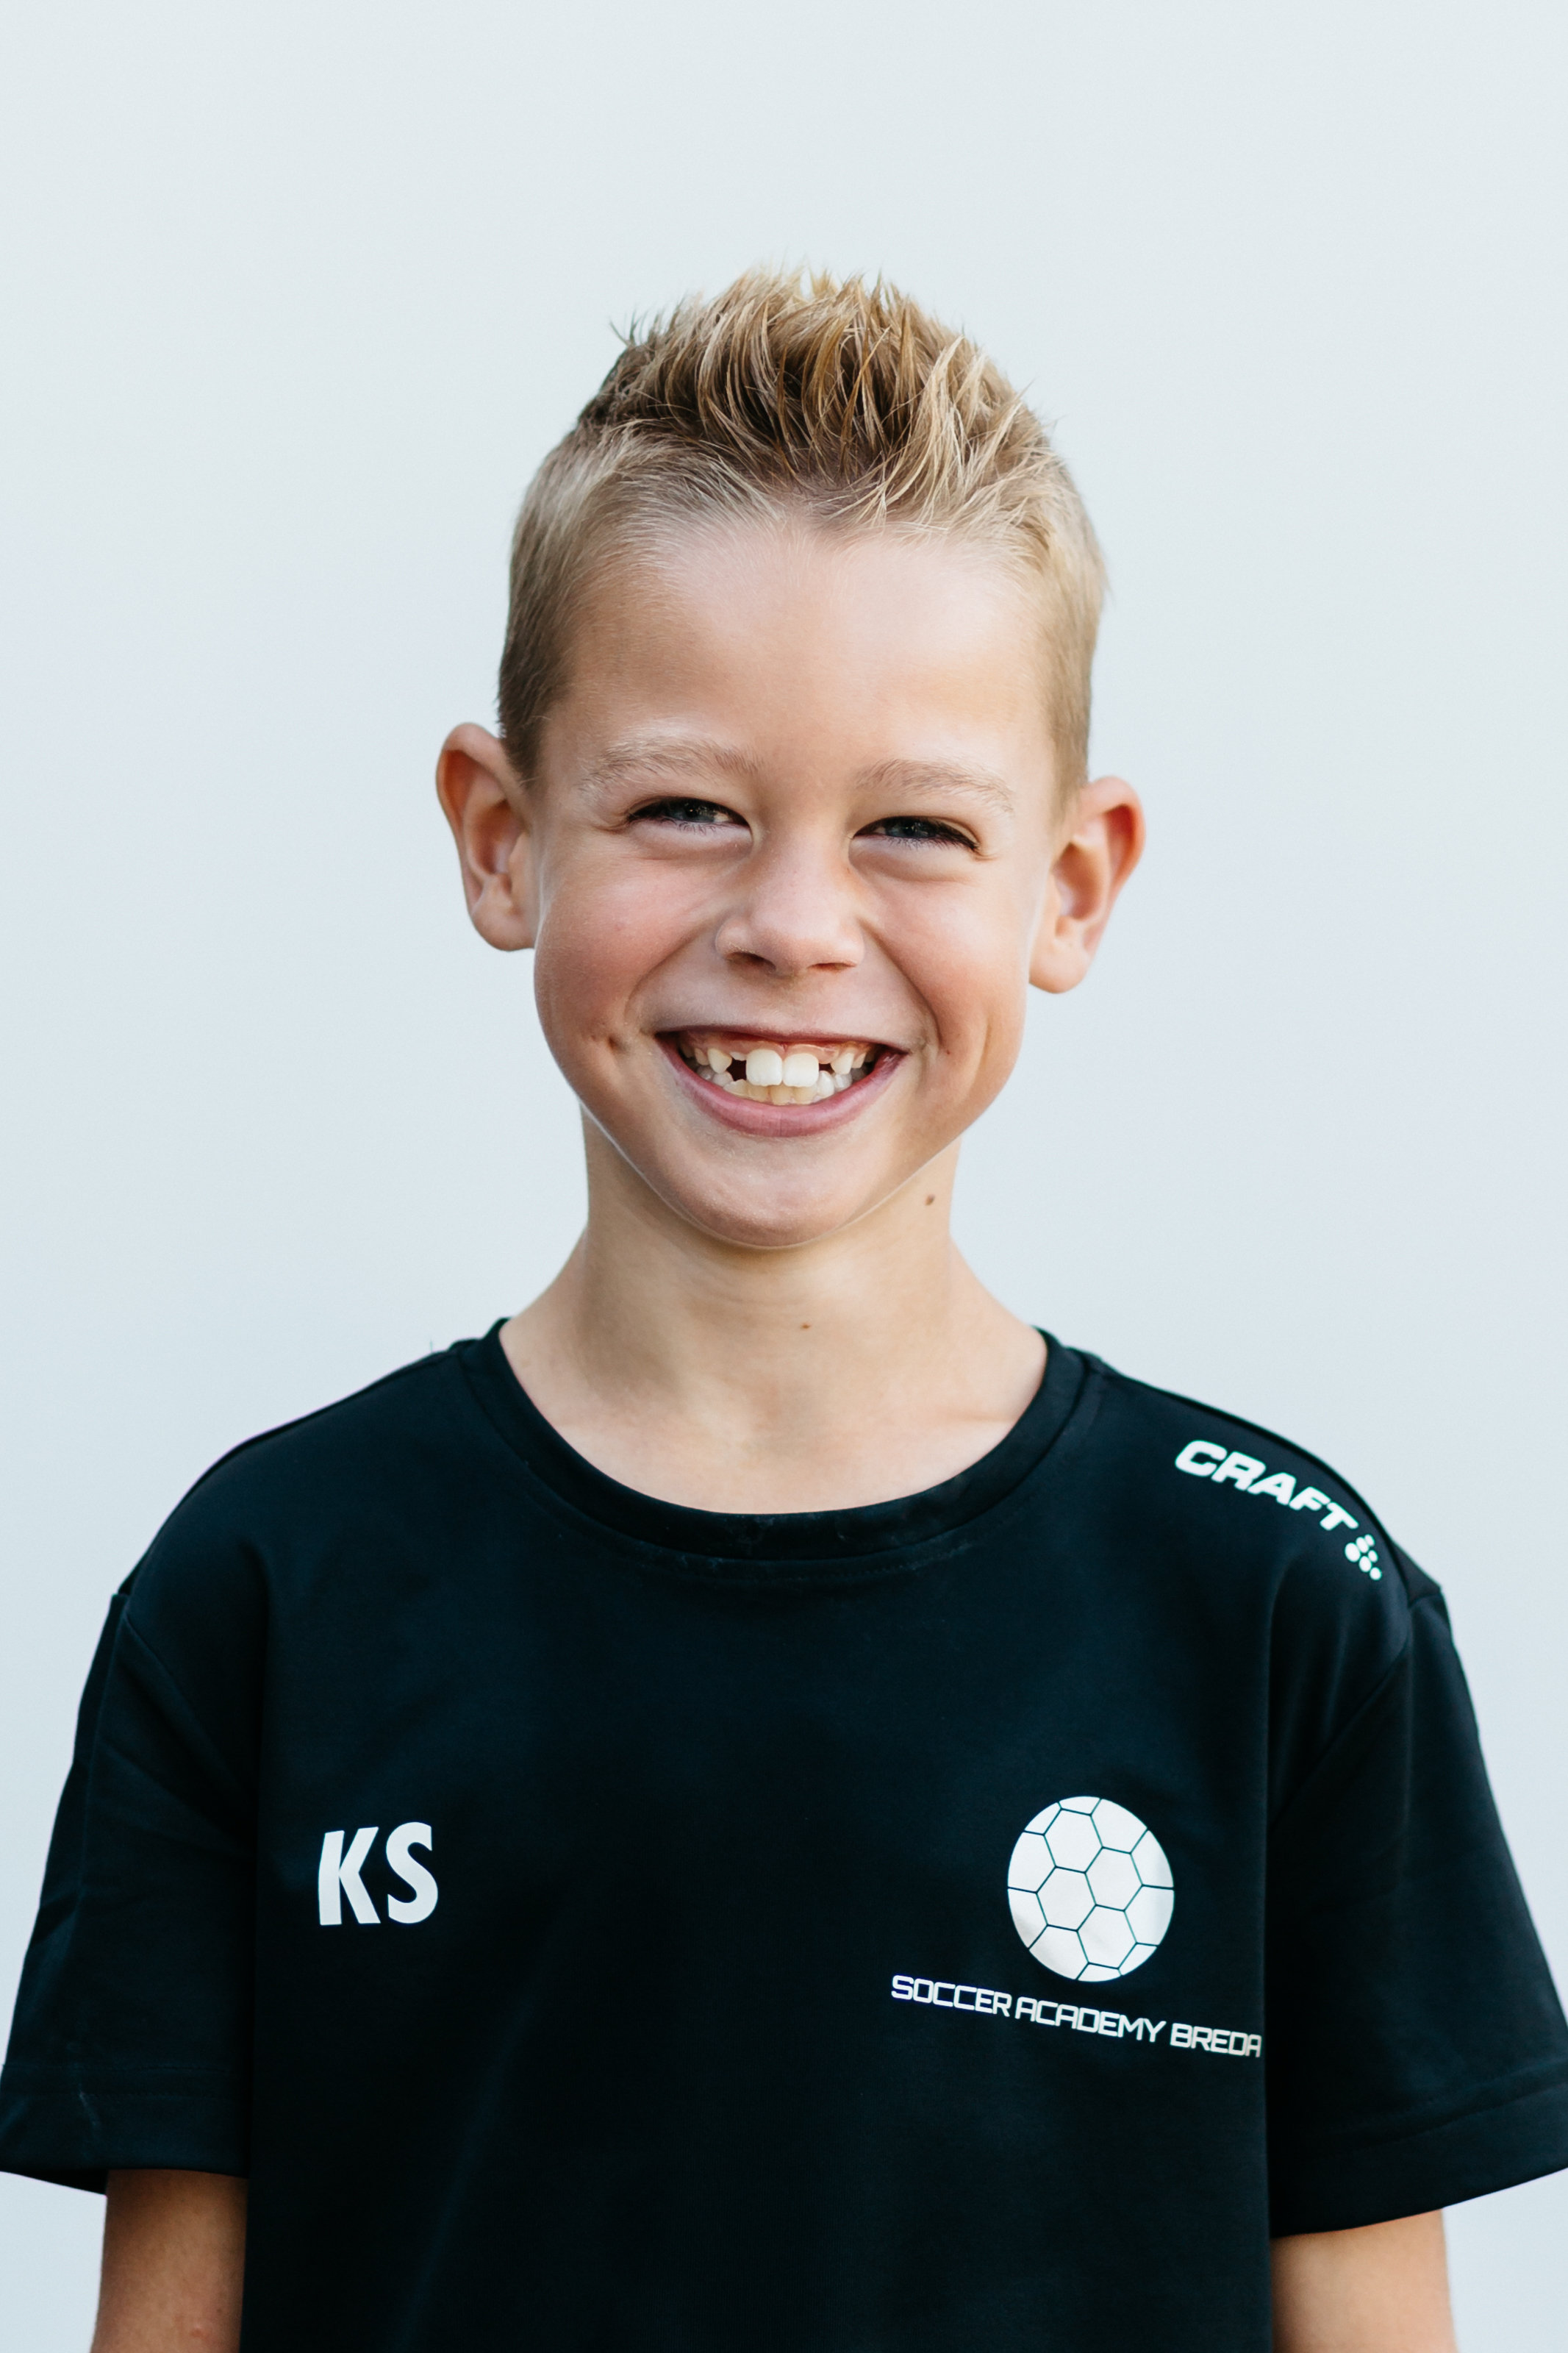 https://socceracademybreda.nl/wp-content/uploads/2020/10/kian-santbergen-teampagina.jpg